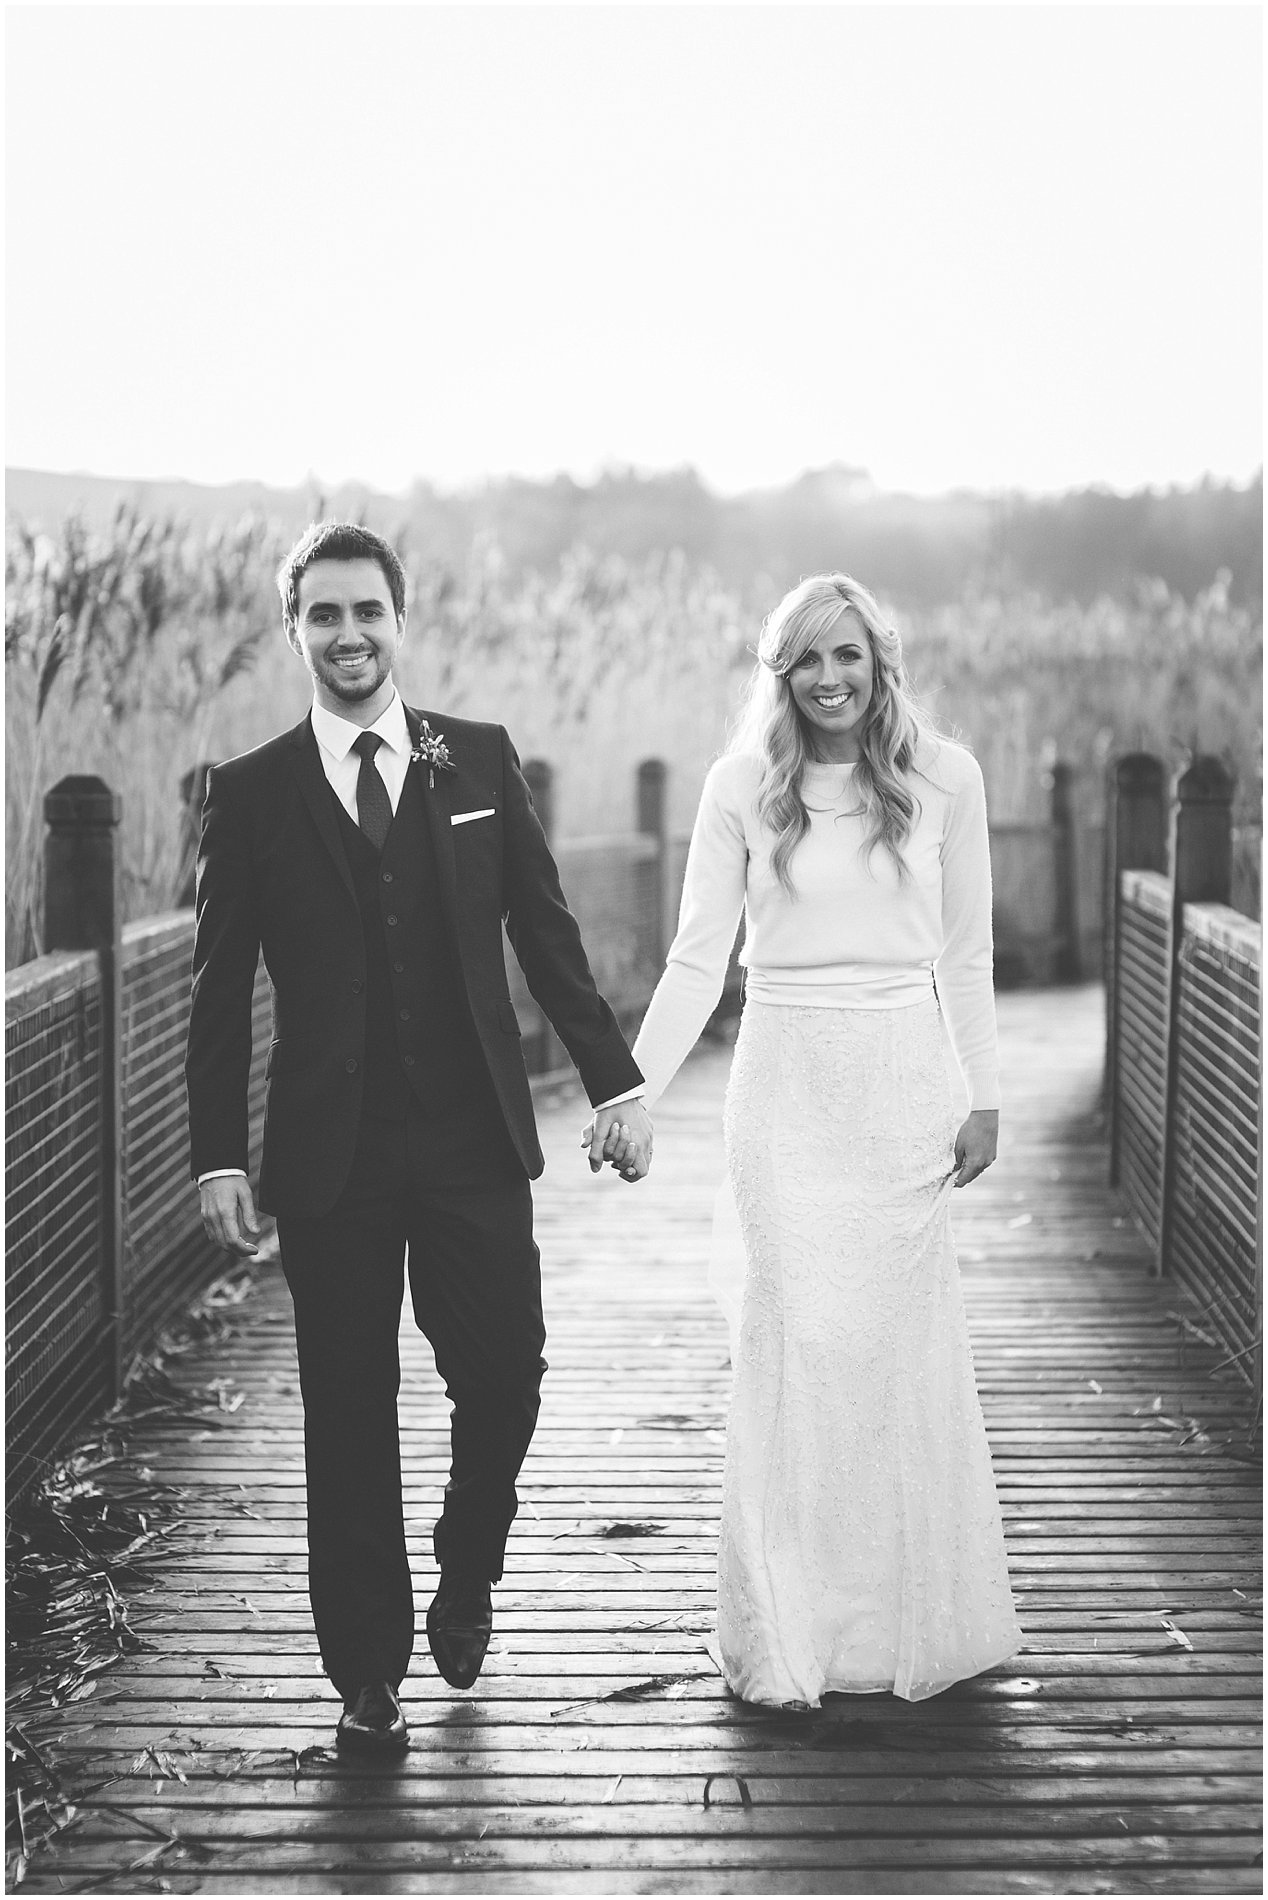 jill_Chris_Lough_Erne_Resort_Wedding_0135.jpg